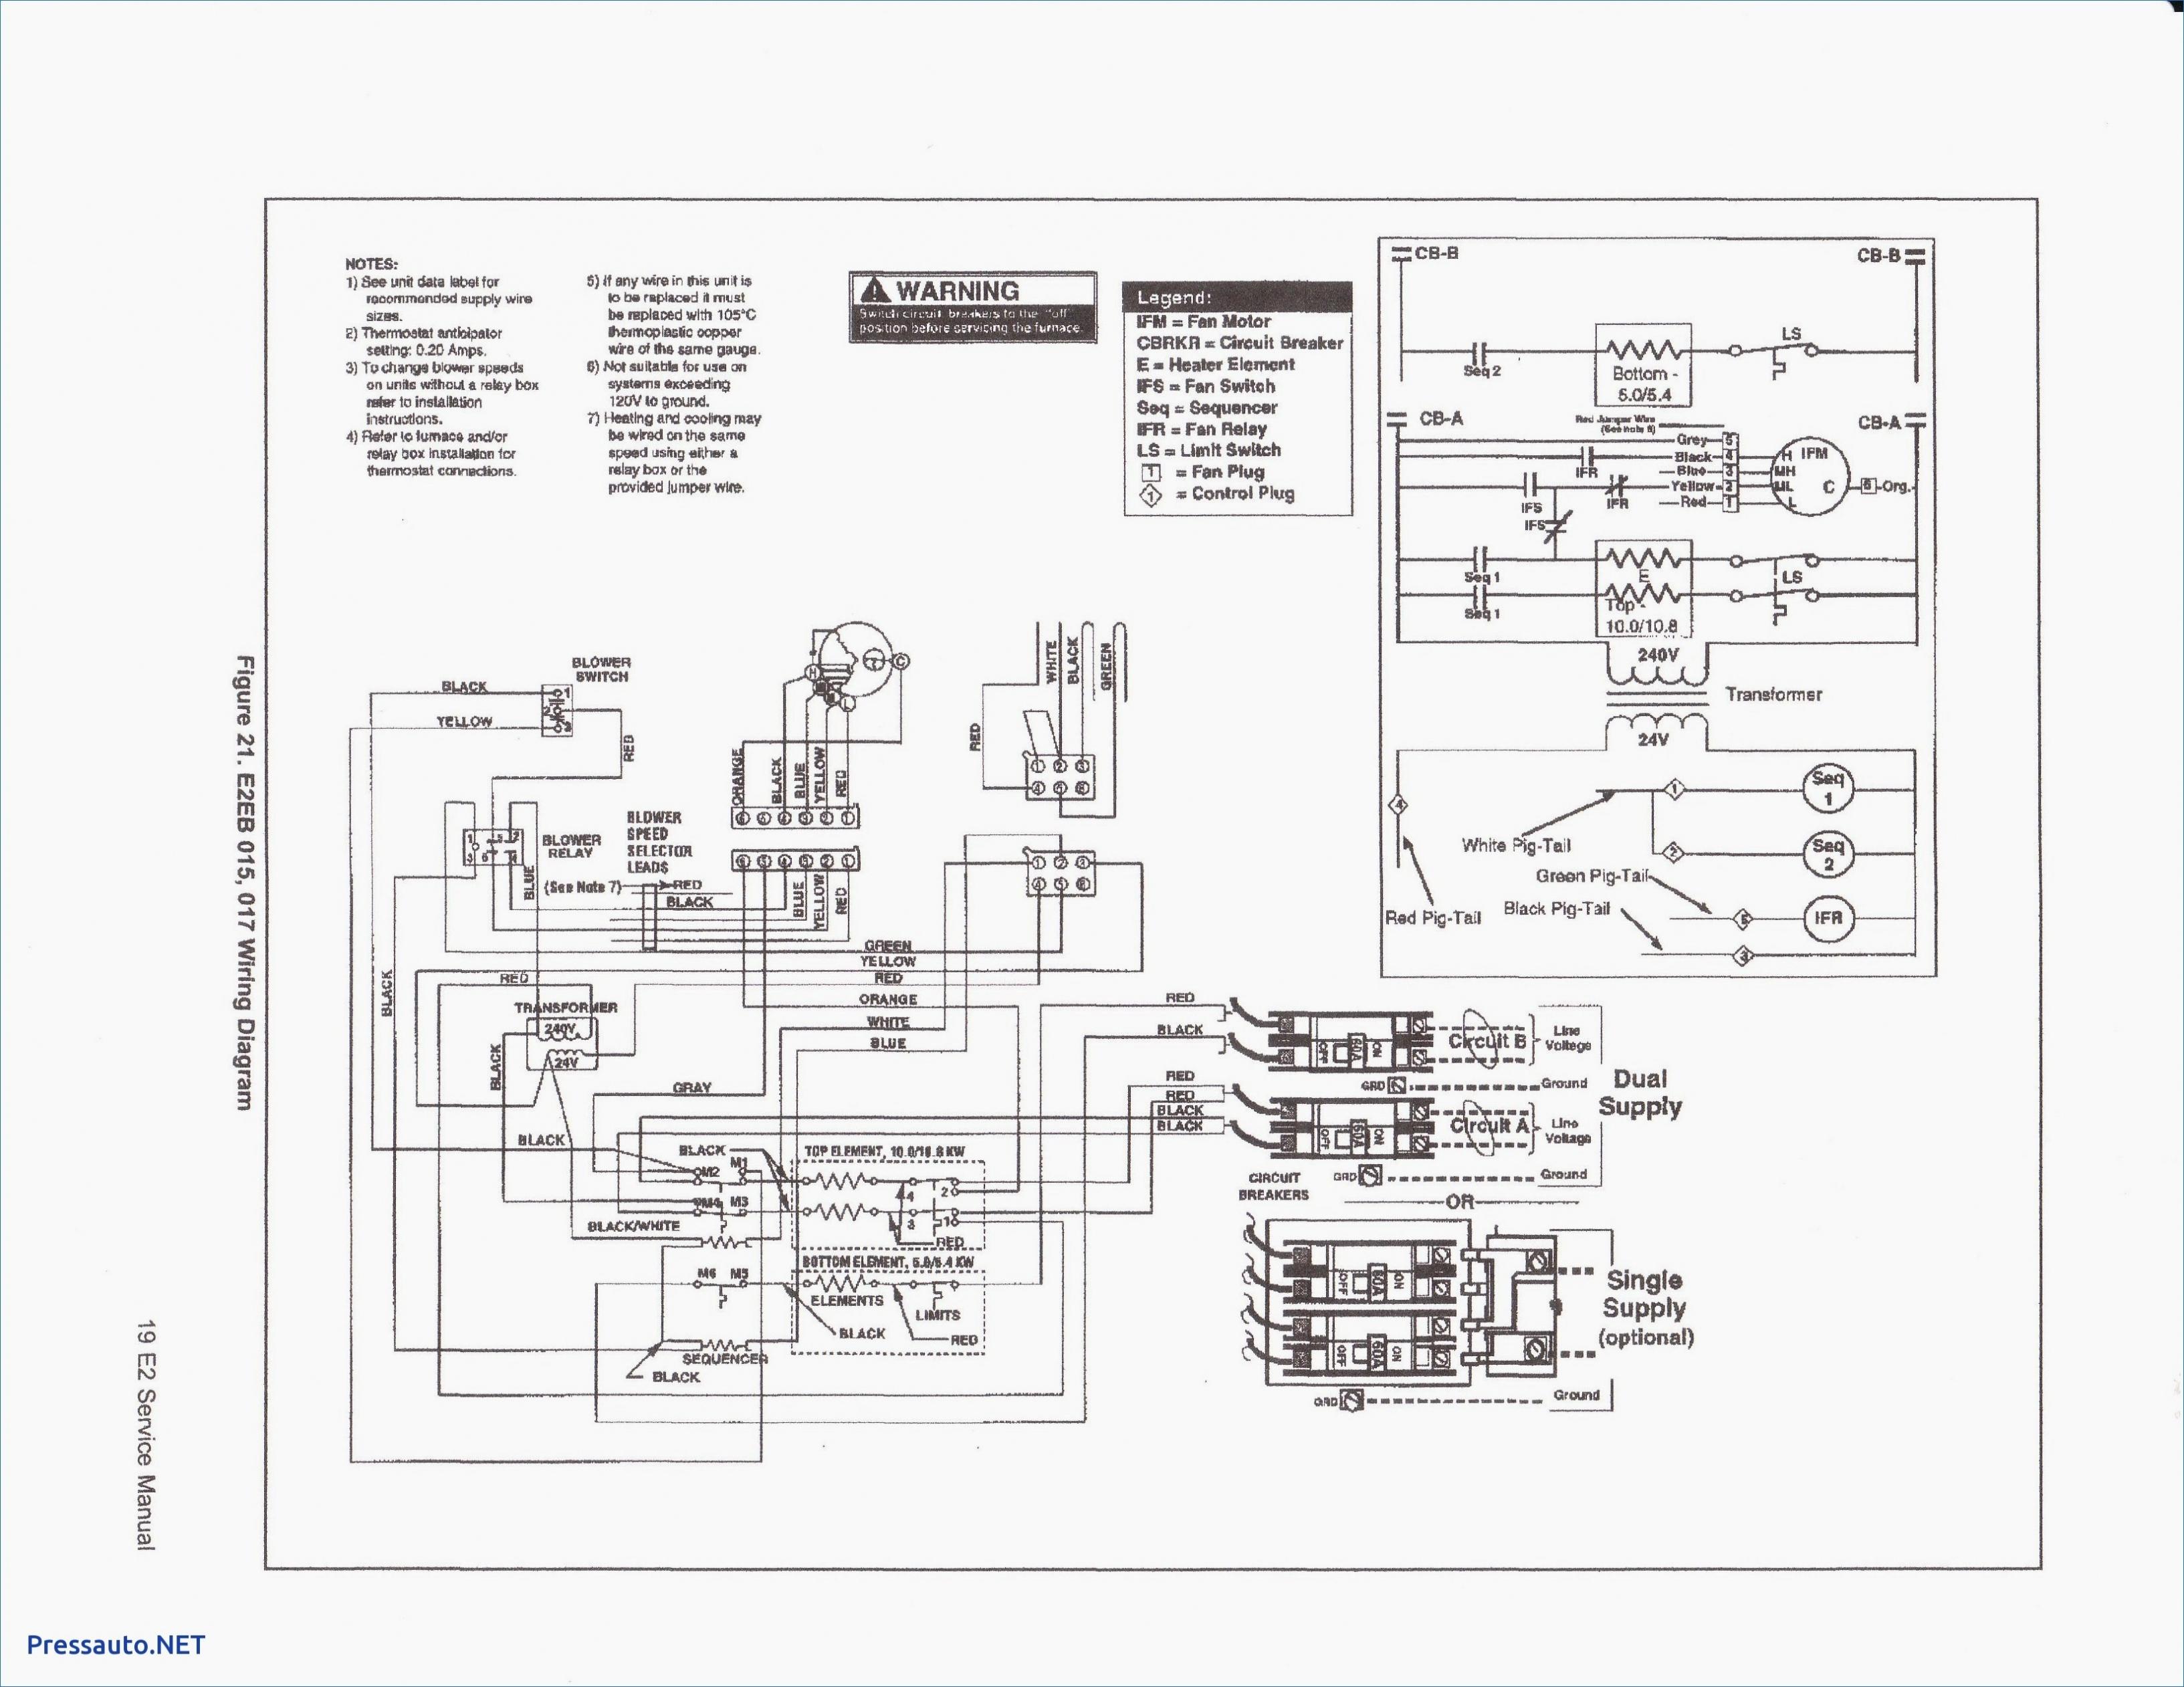 Goodman Air Handler Wiring Diagram For Ar61 1   Wiring Diagram - Goodman Air Handler Wiring Diagram